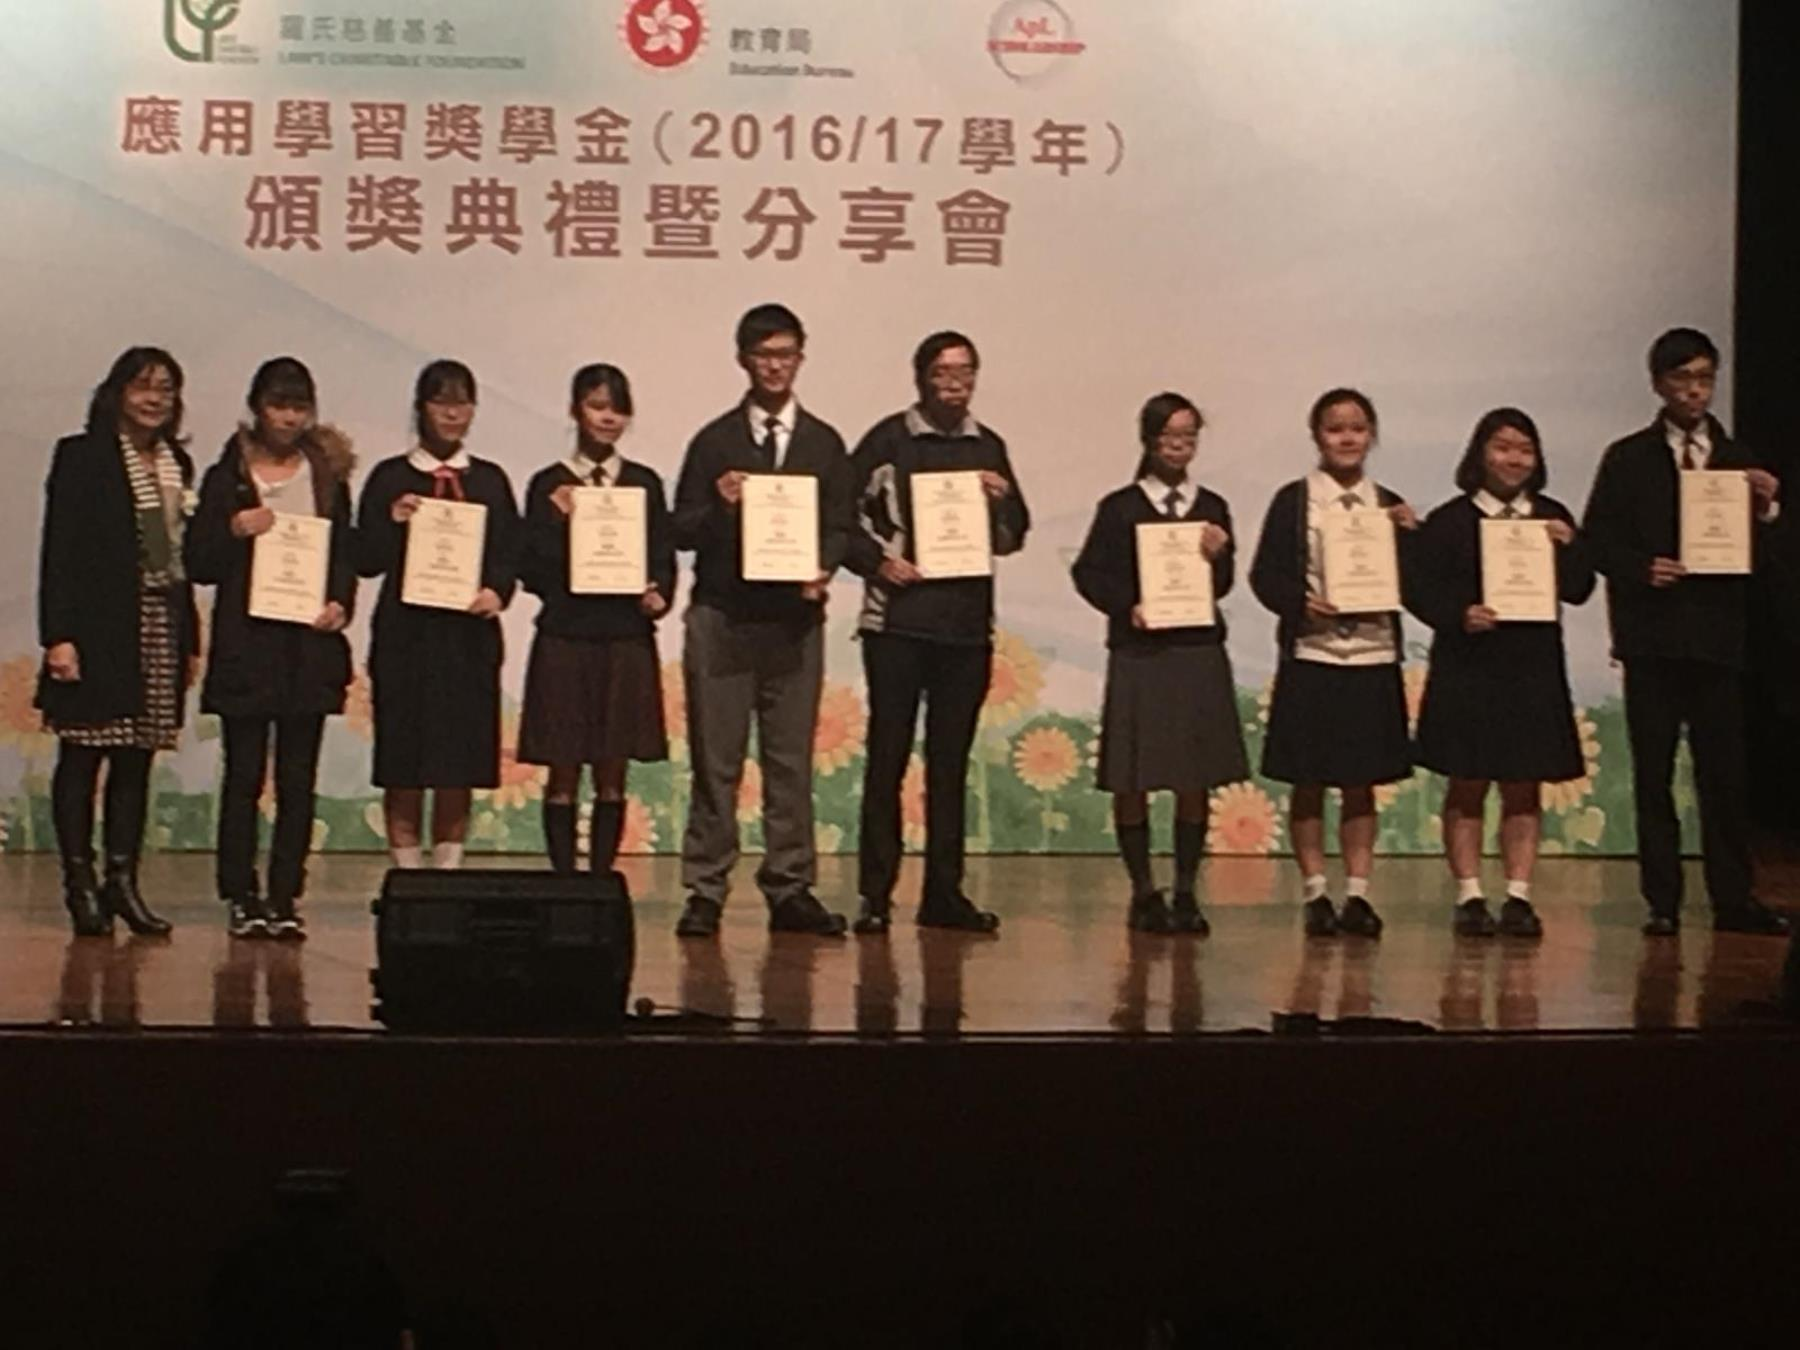 http://npc.edu.hk/sites/default/files/image_1.jpg